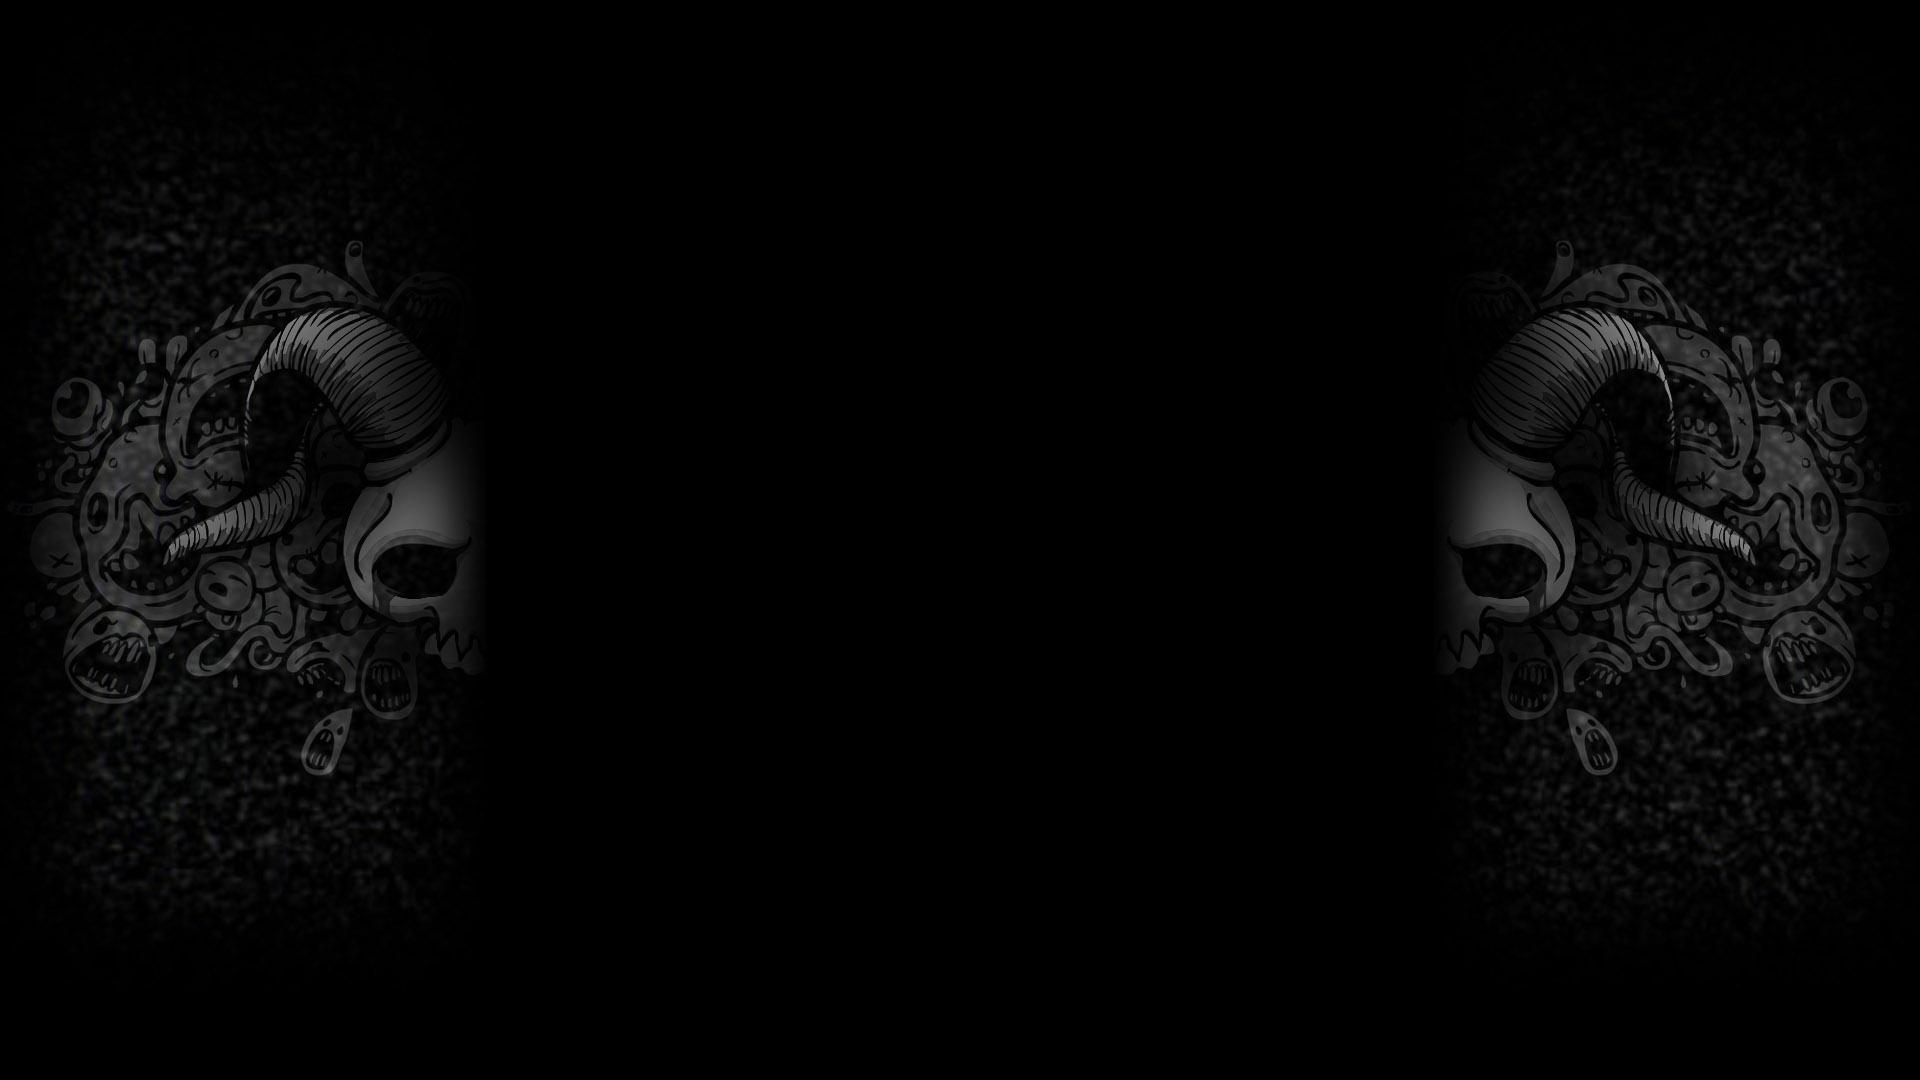 Venom Black And White Hd Wallpaper